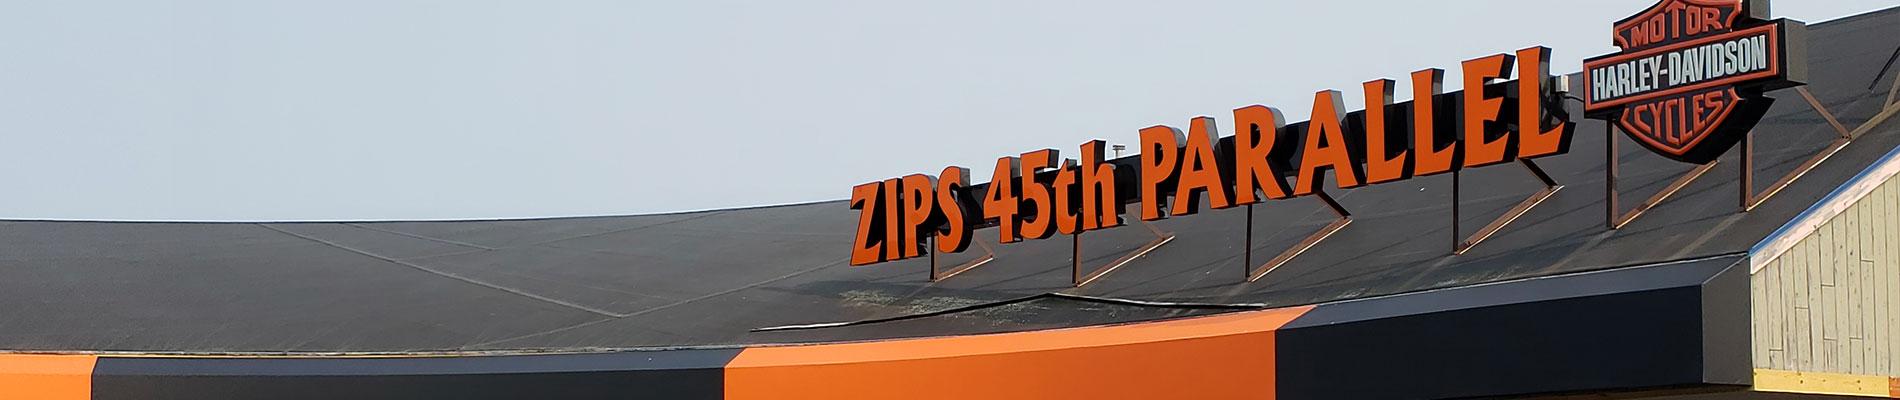 Zips 45th Parallel Harley-Davidson